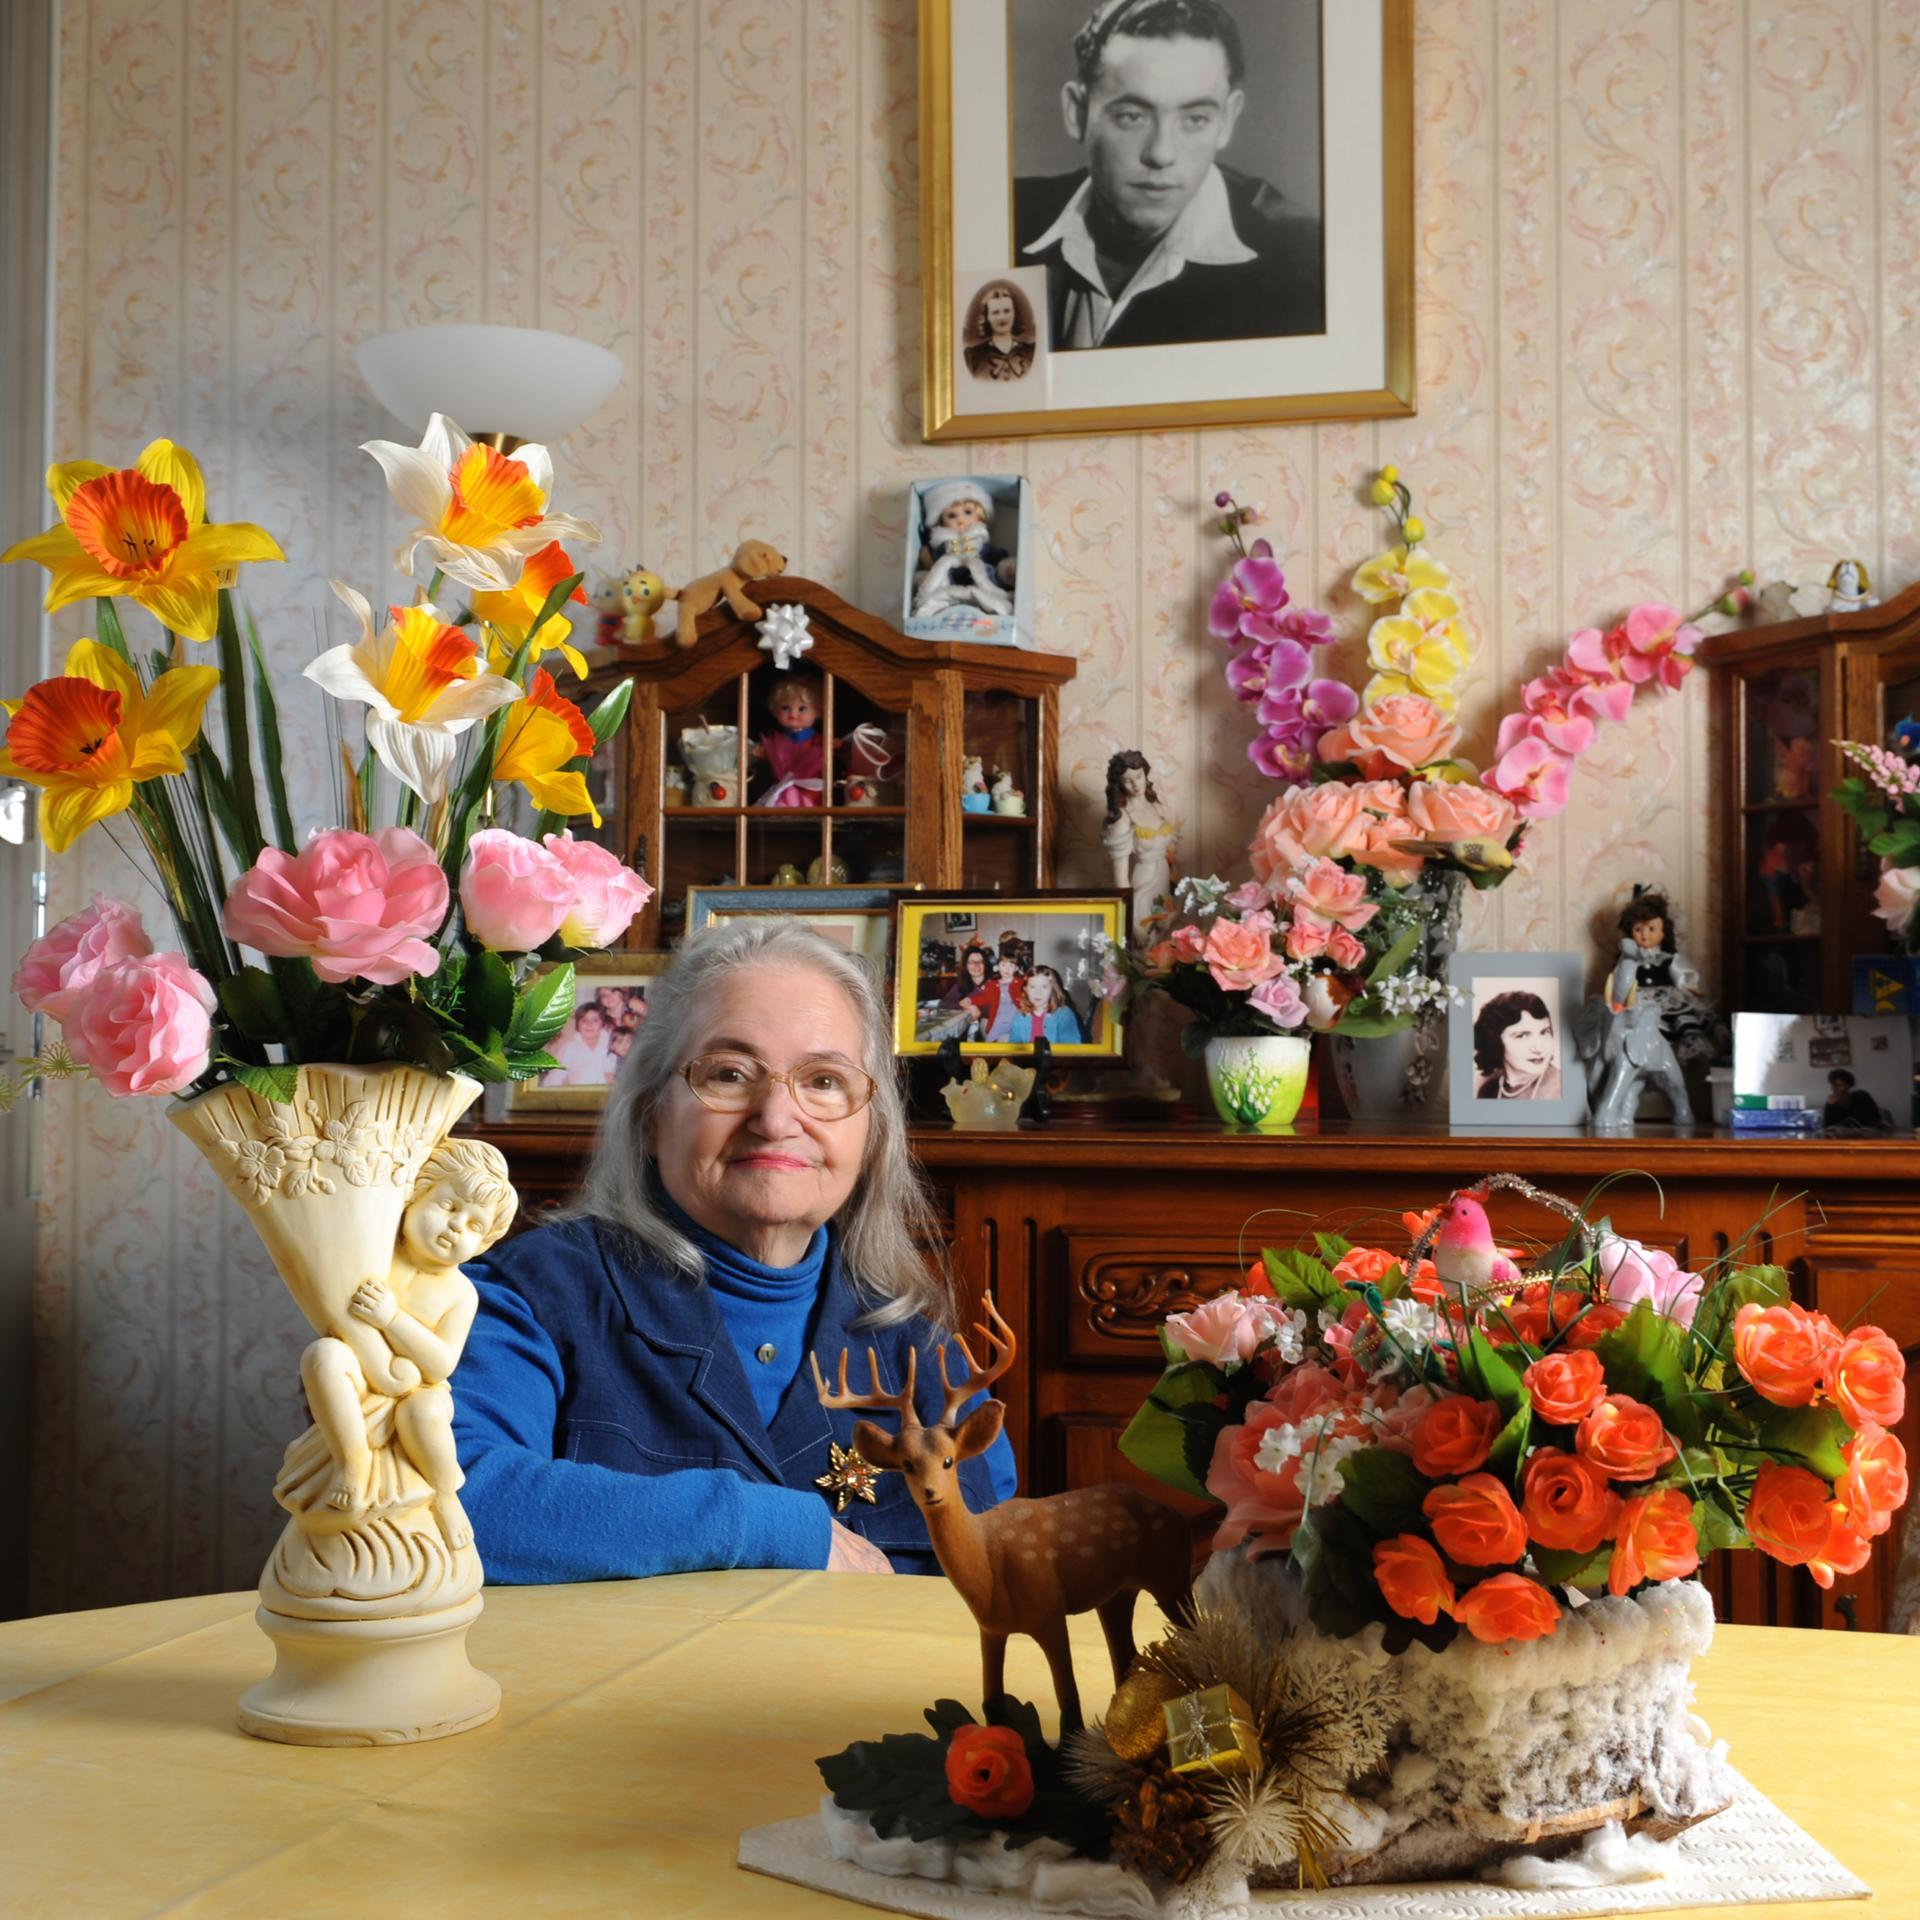 Simone M. - 75 ans